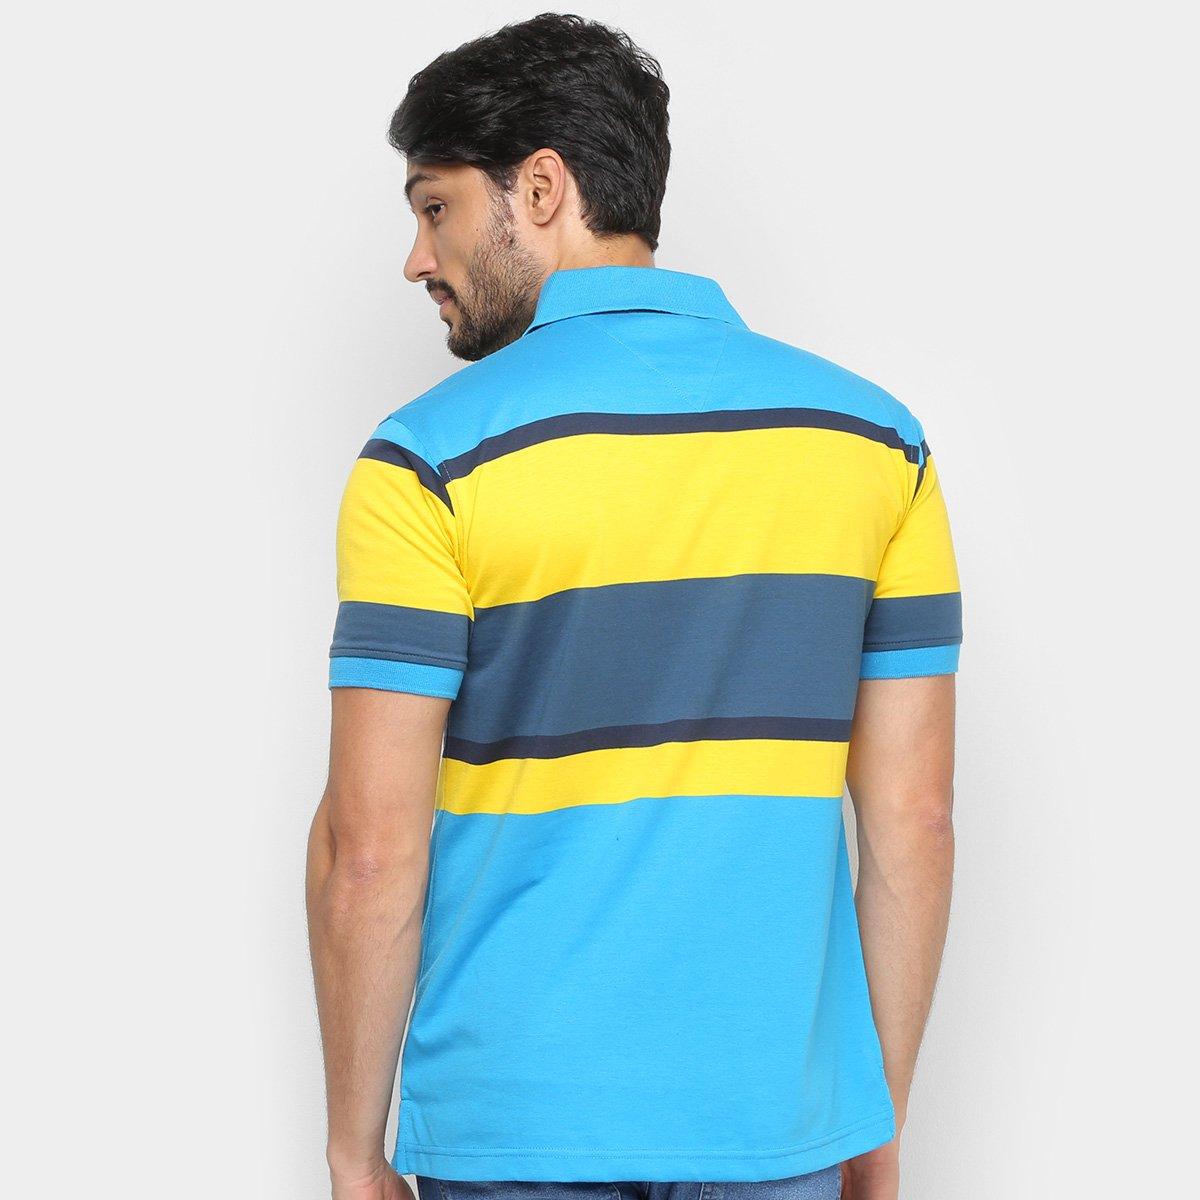 Camisa Polo Aleatory Listrada Botões Masculina - Azul e amarelo